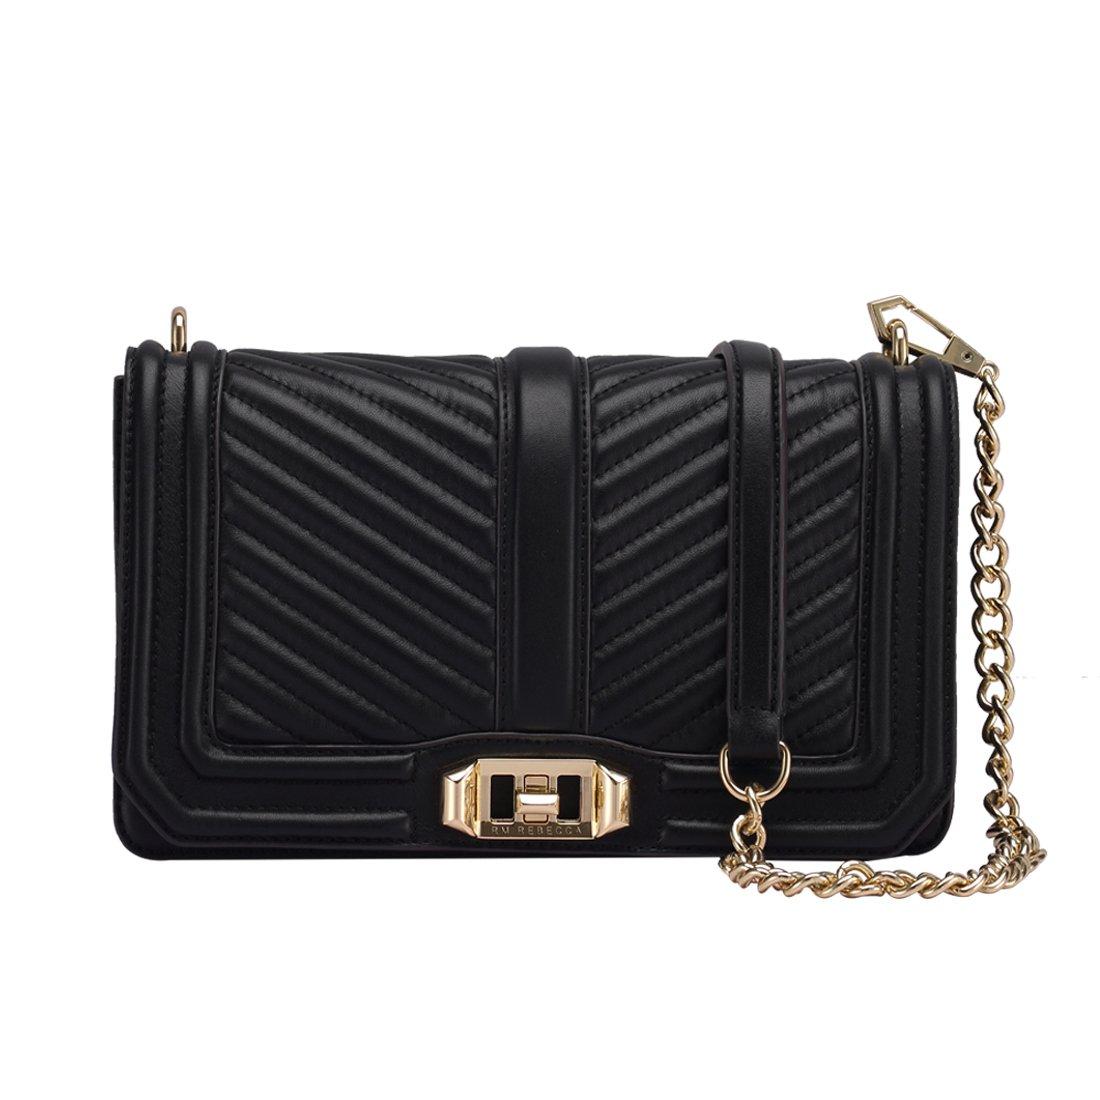 Women's Leather Messenger Bag Mini Chain Bag Adjustable Shoulder BagWomen's Fashion Shoulder Bag Quilting Chain Cross Ladies Handbag (Black)